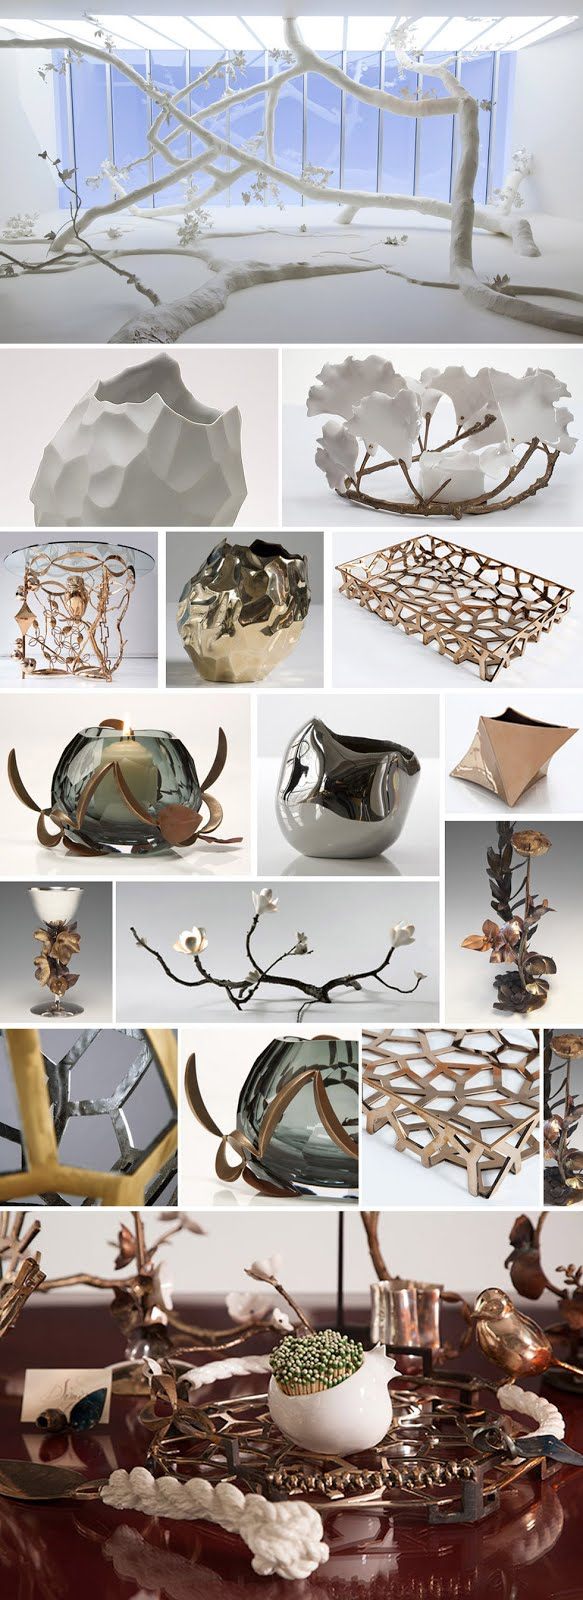 Objetos e esculturas  de David Wiseman.